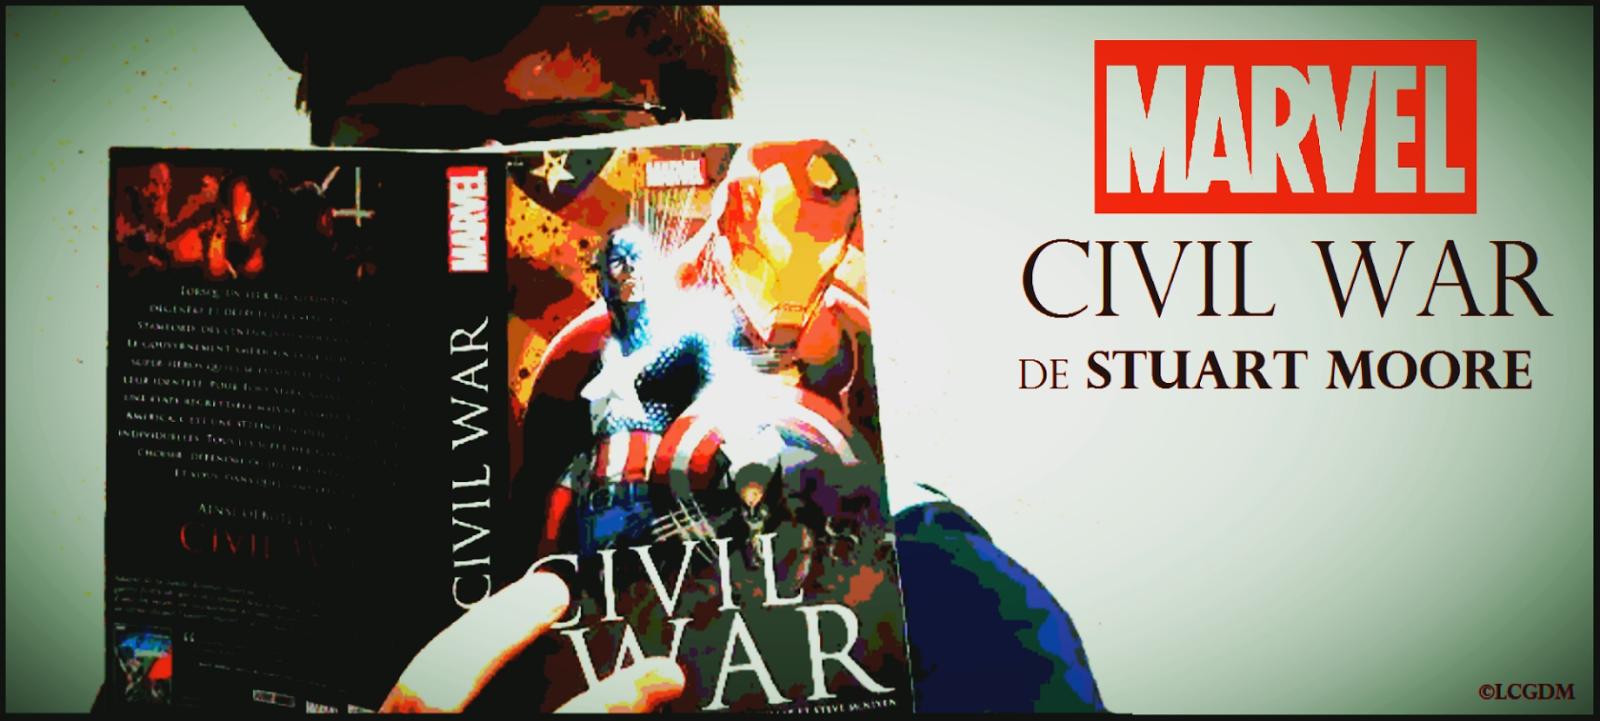 http://les-chroniques-geek.blogspot.fr/2013/05/civil-war-de-stuart-moore.html